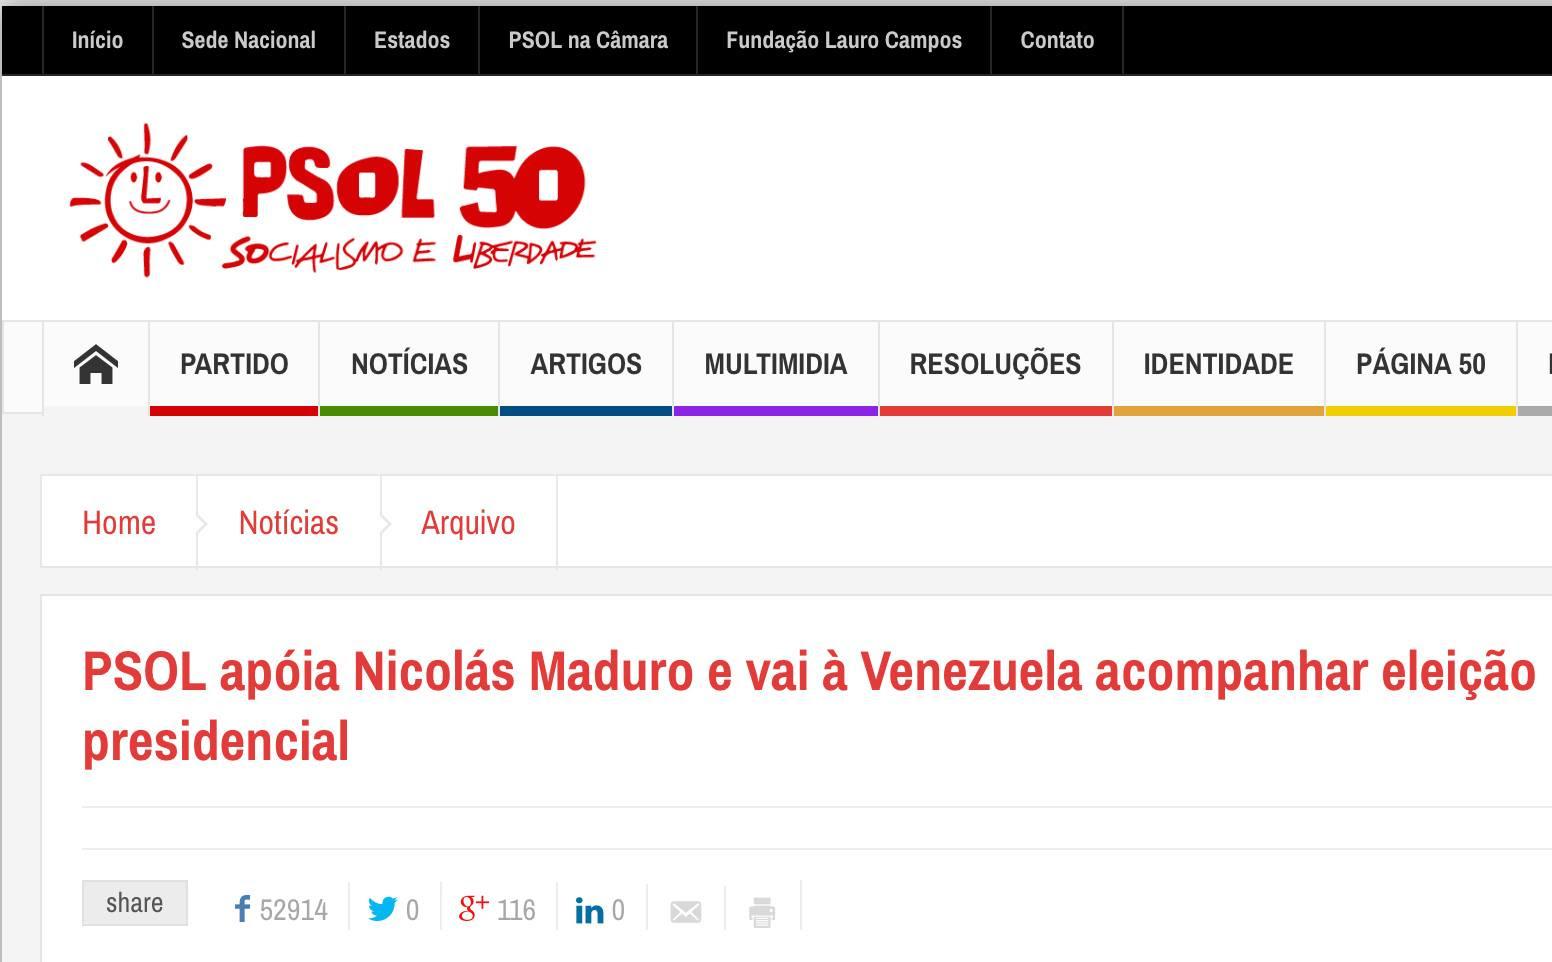 PSOL posta defesa de ditador Nicolás Maduro da Venezuela